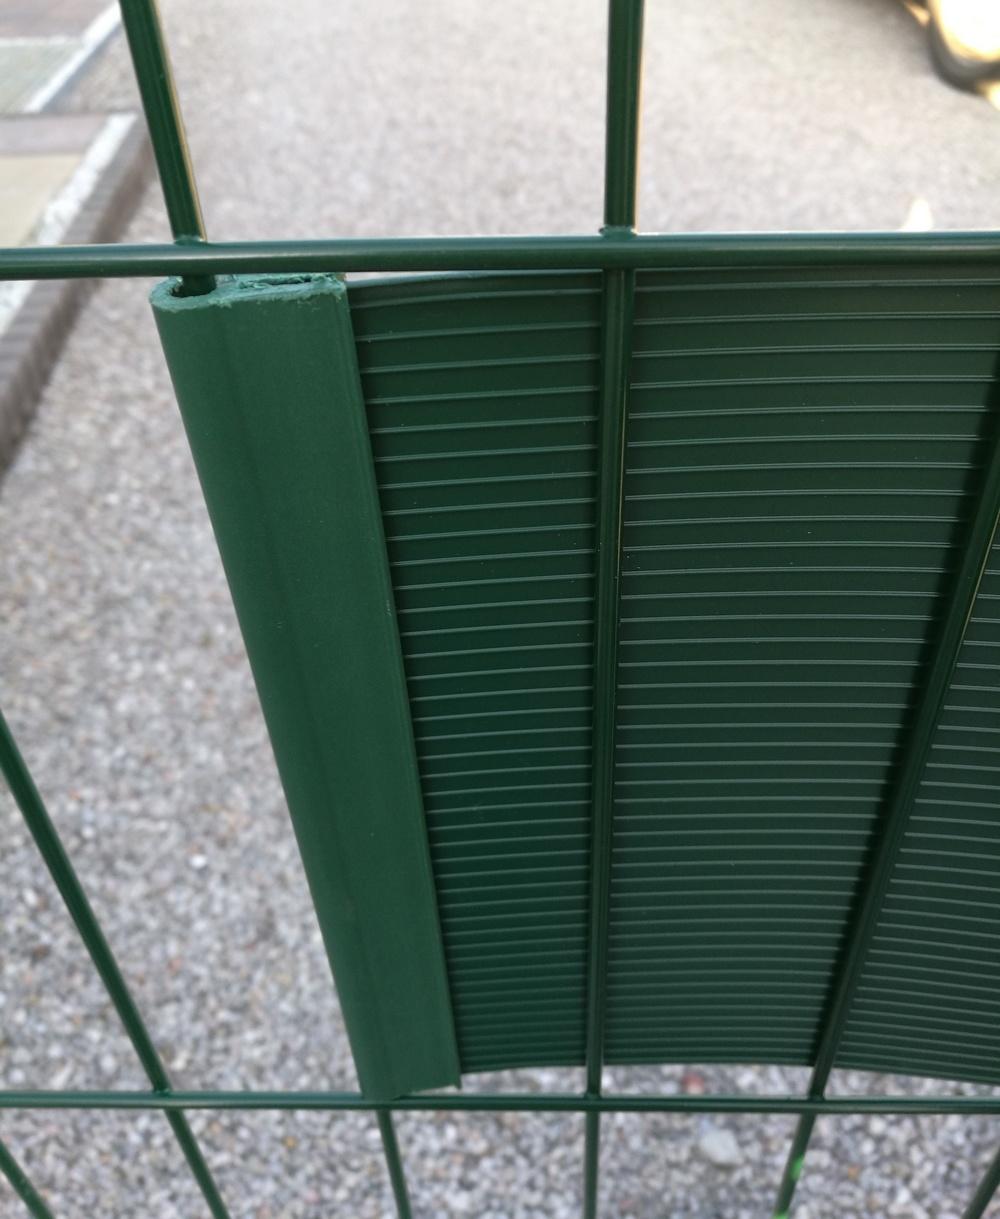 Gipea Easy To Fix Optimal Visibility Protection For Gate & Fence per stuk Gipea Ekoband Pro montage klem 19 cm